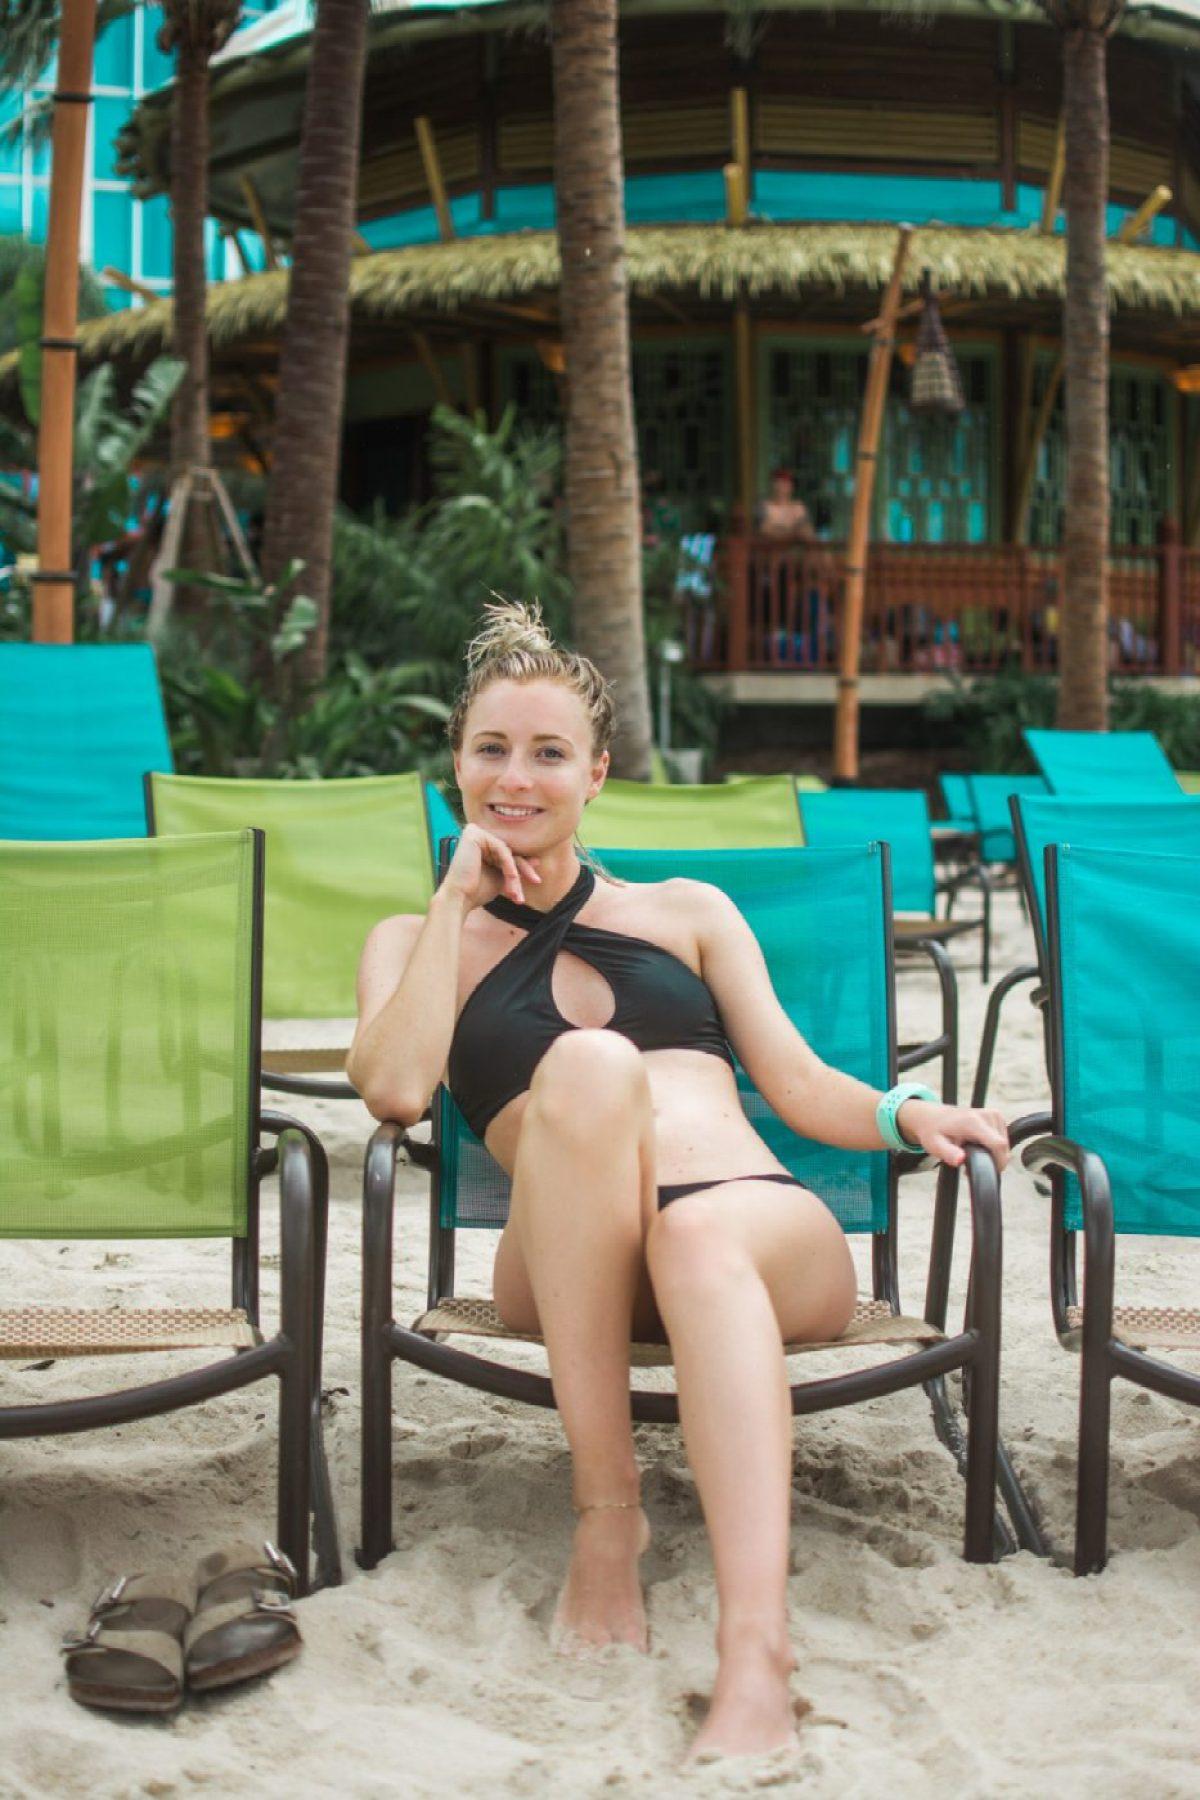 Jenny of Sweet Teal at Volcano Bay